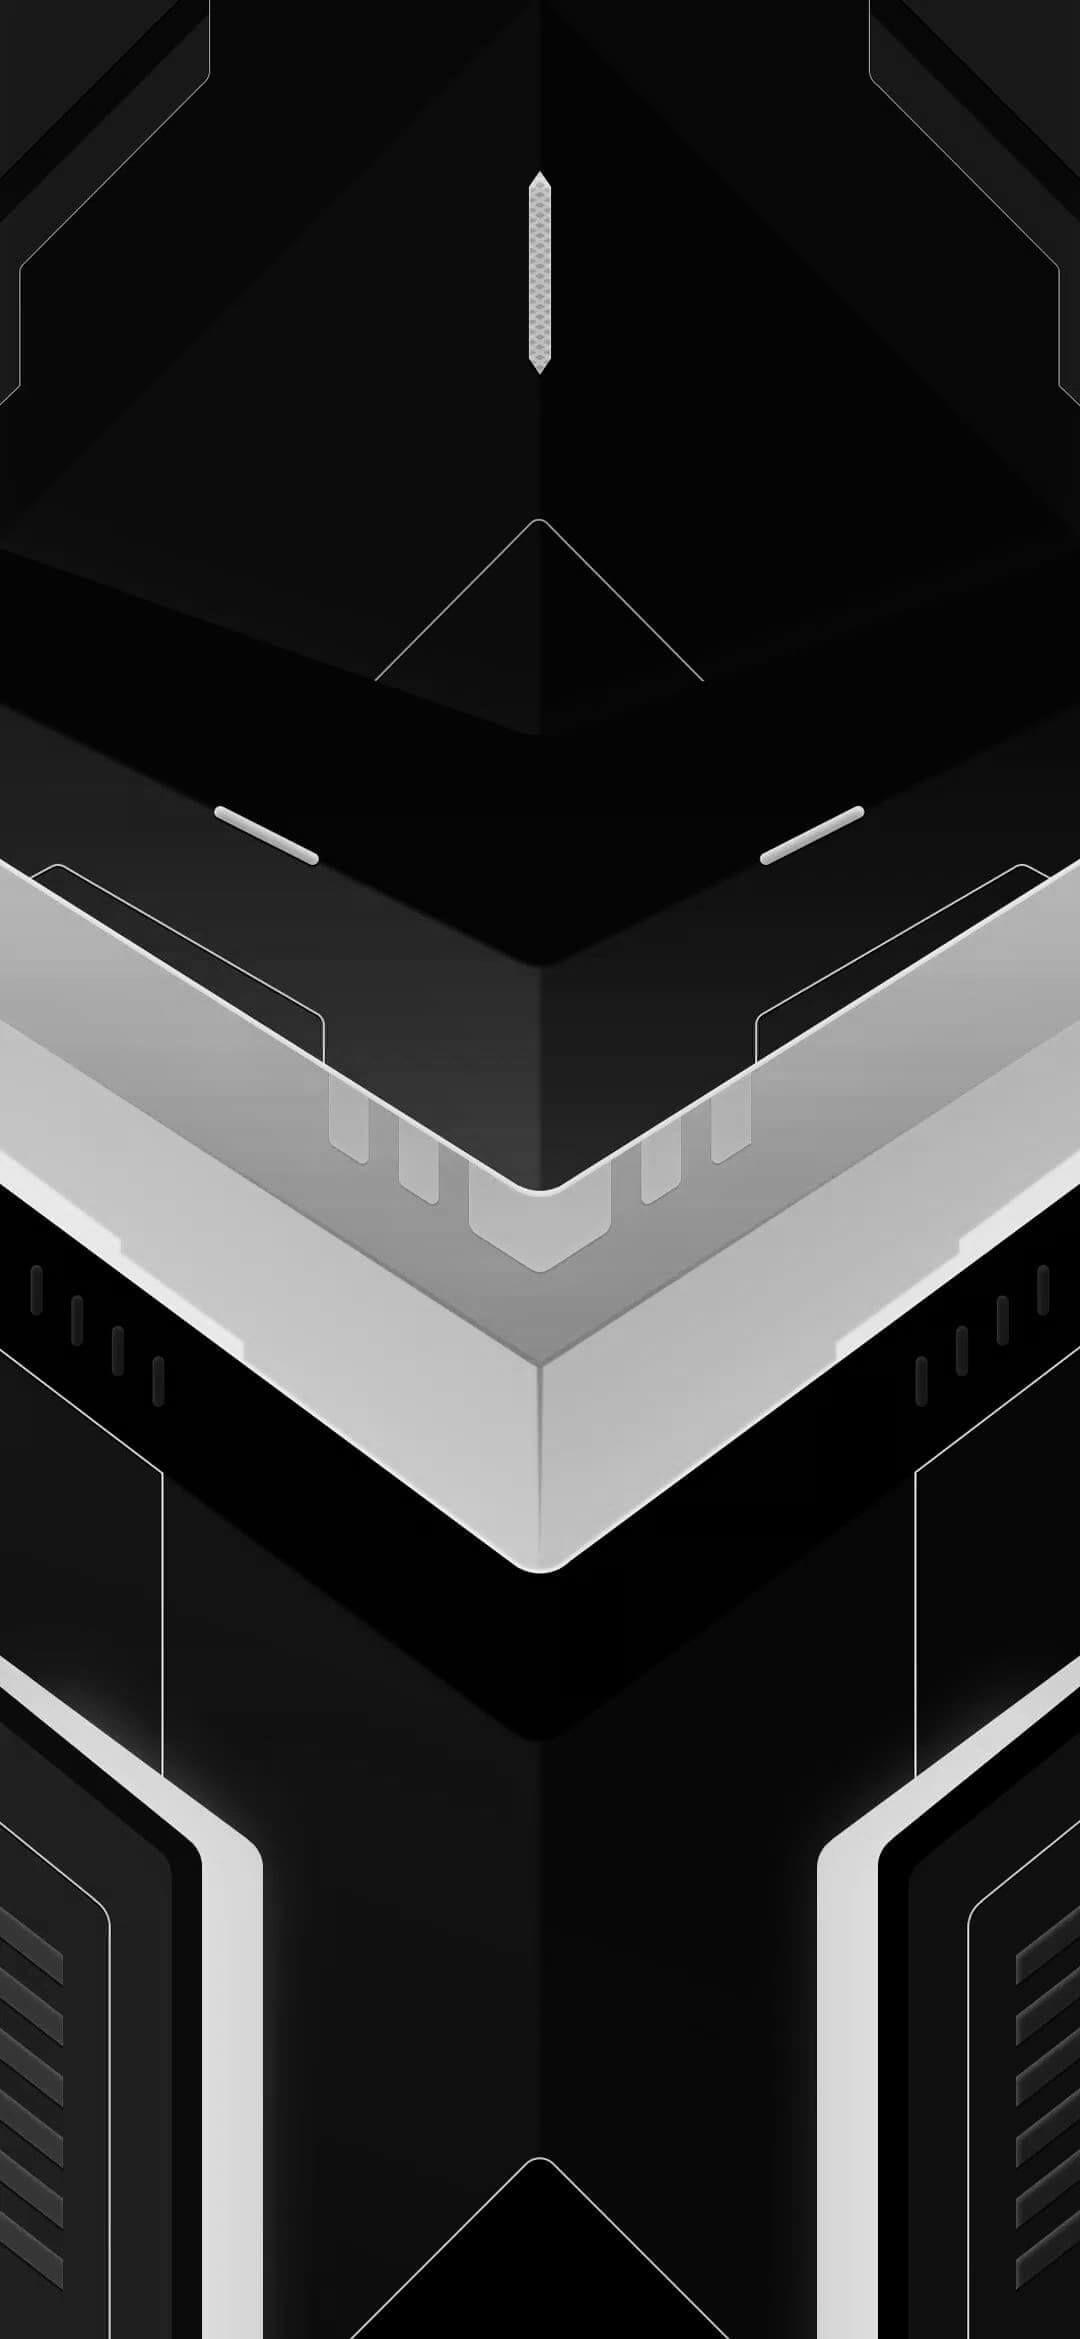 Oppo Reno Black Gundam Wallpaper Wallpaper Android Material Design Gundam Wallpapers